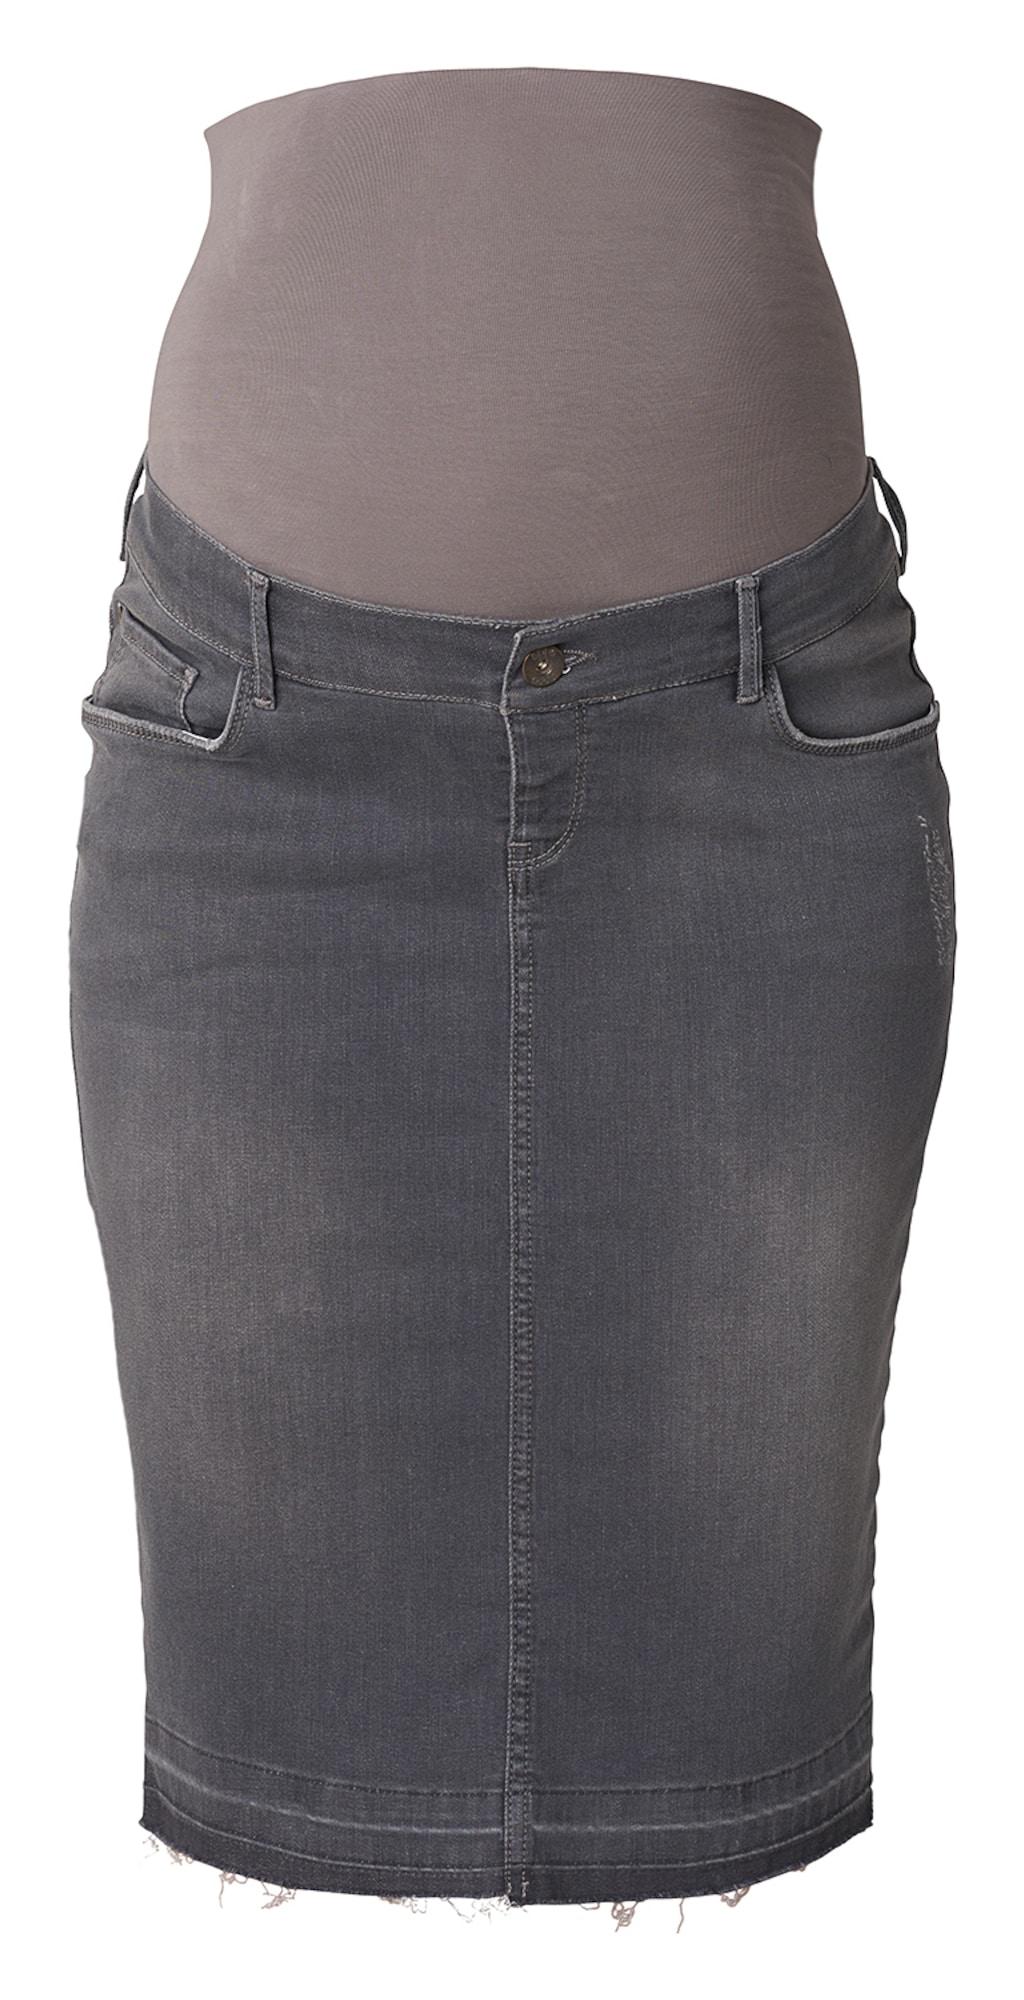 Umstandsrock Jeans Joy | Bekleidung > Umstandsmode > Umstandsröcke | Grau | Noppies